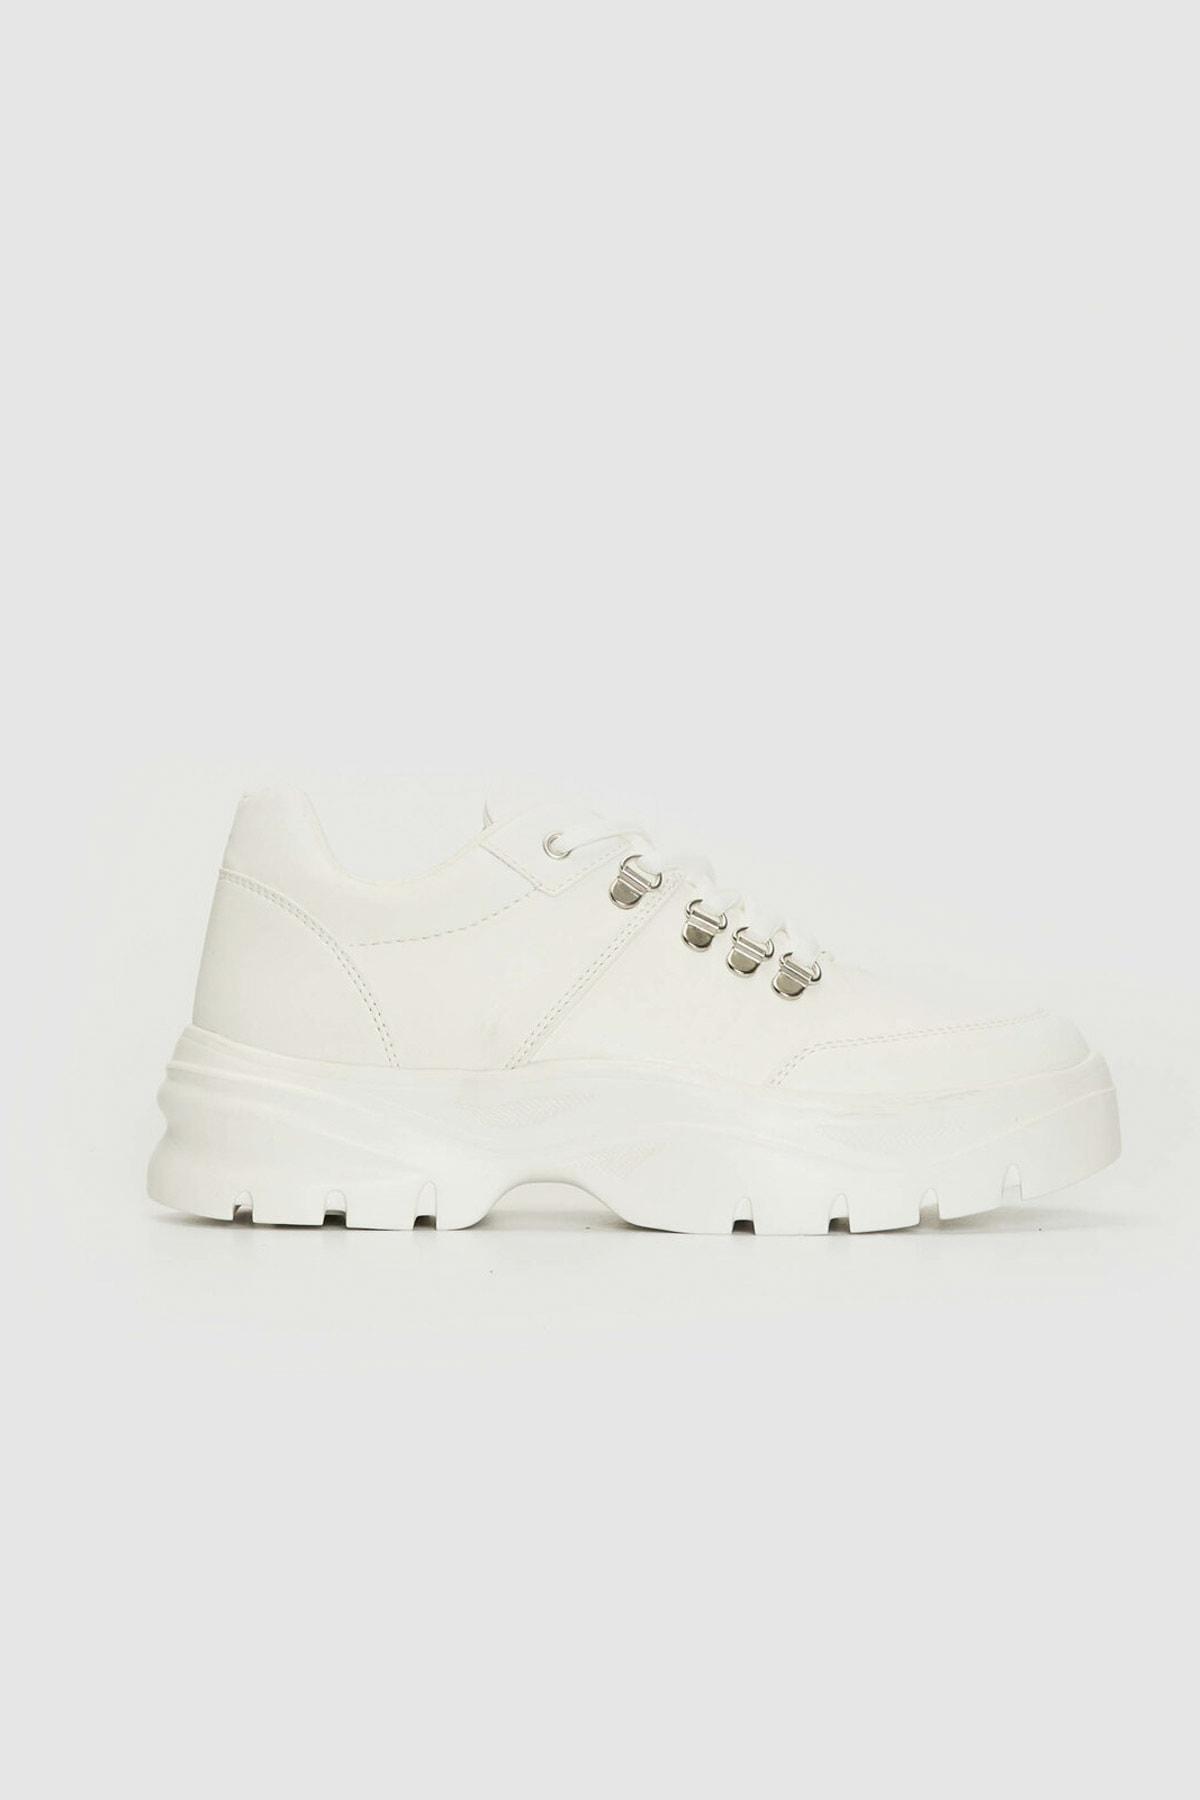 LC Waikiki Kadın Beyaz J5E Sneaker 0WEJ54Z8 1